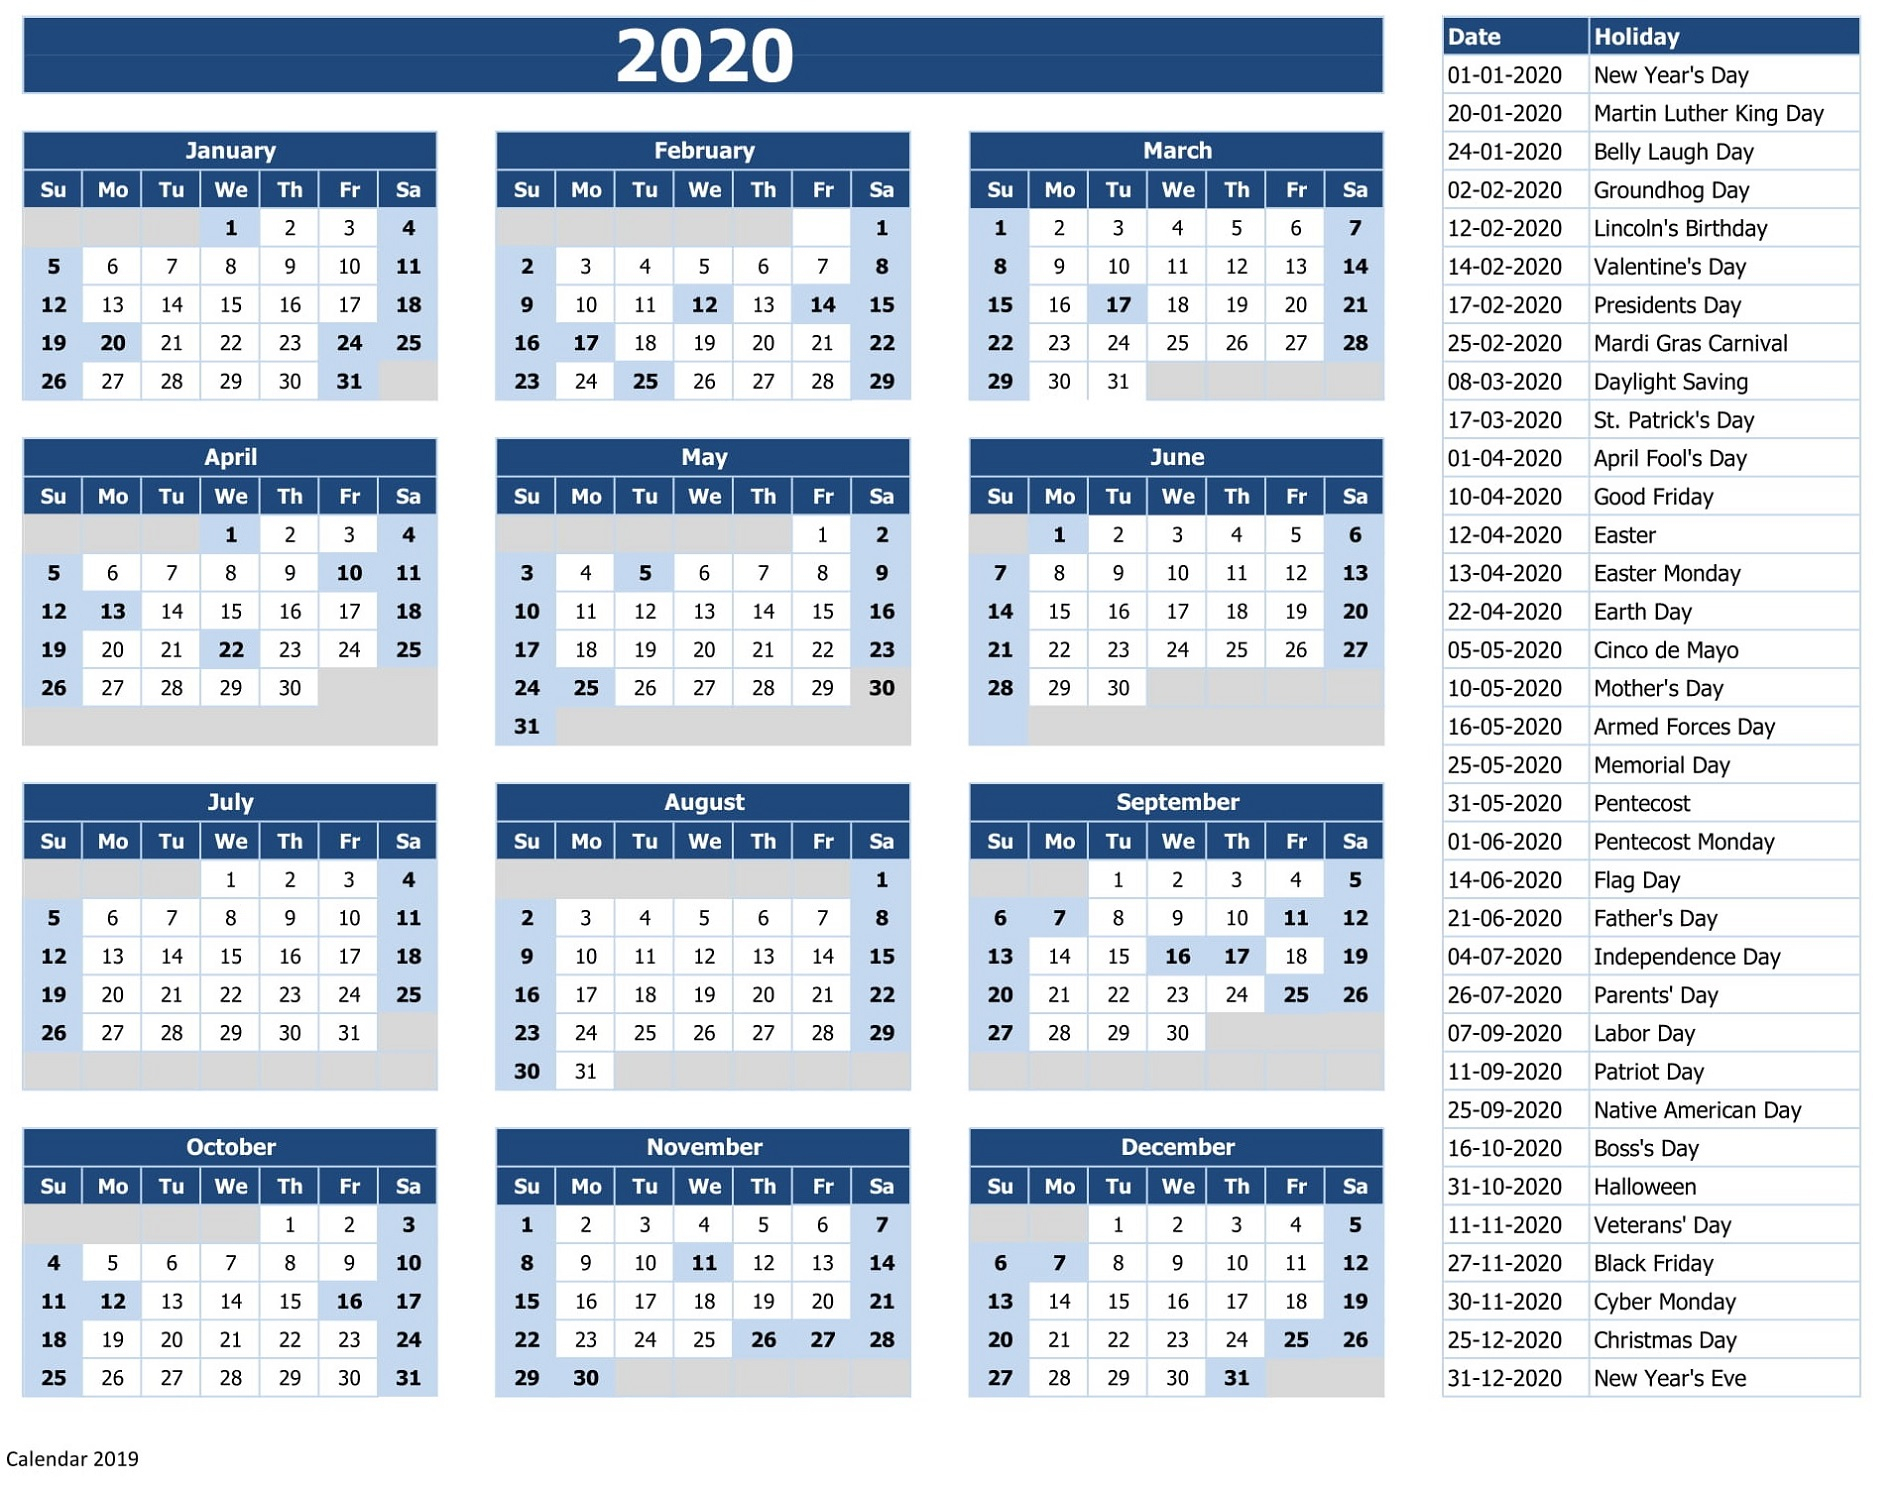 Calendar 2020 With Holidays Excel - Colona.rsd7